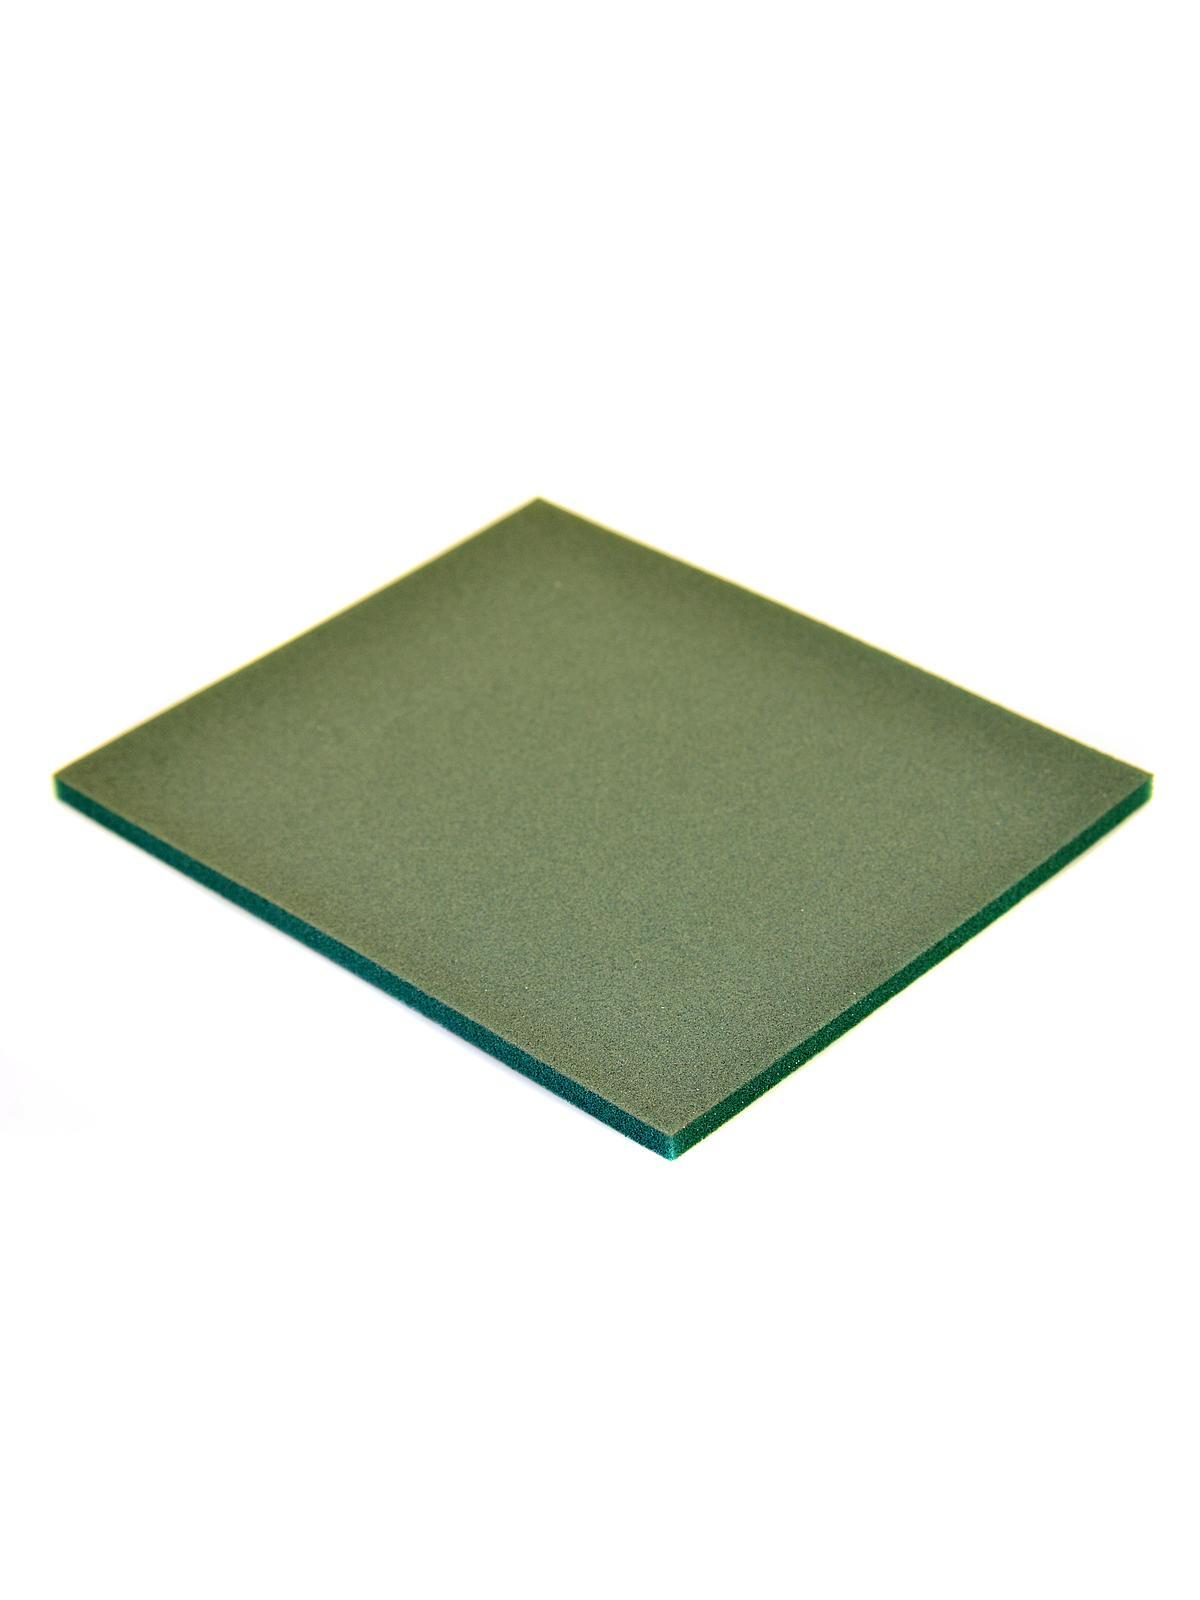 P-Flex Sanding Pads